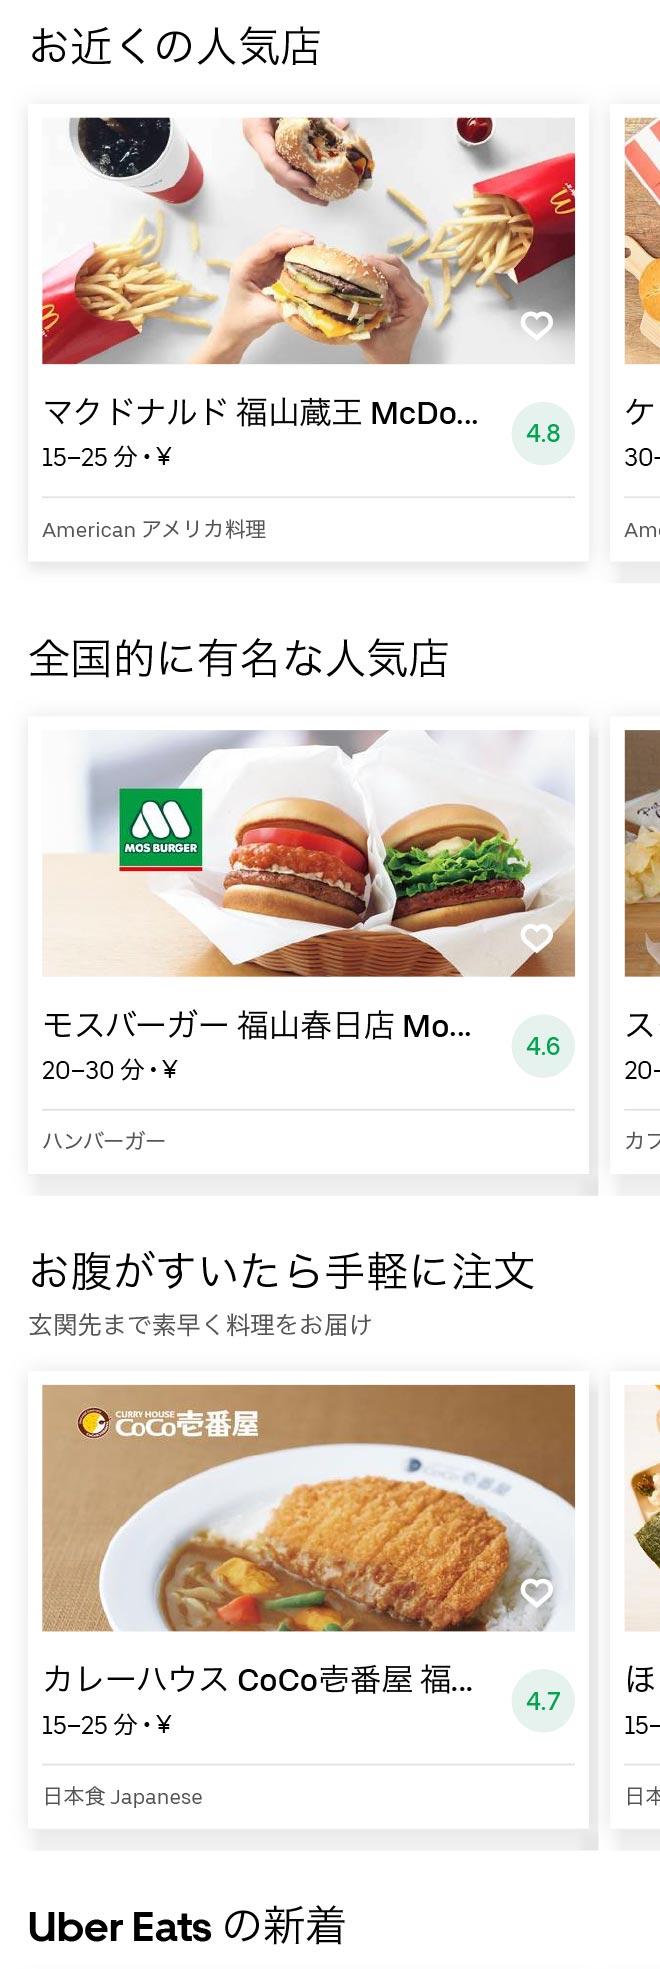 Higashi fukuyama menu 2010 01